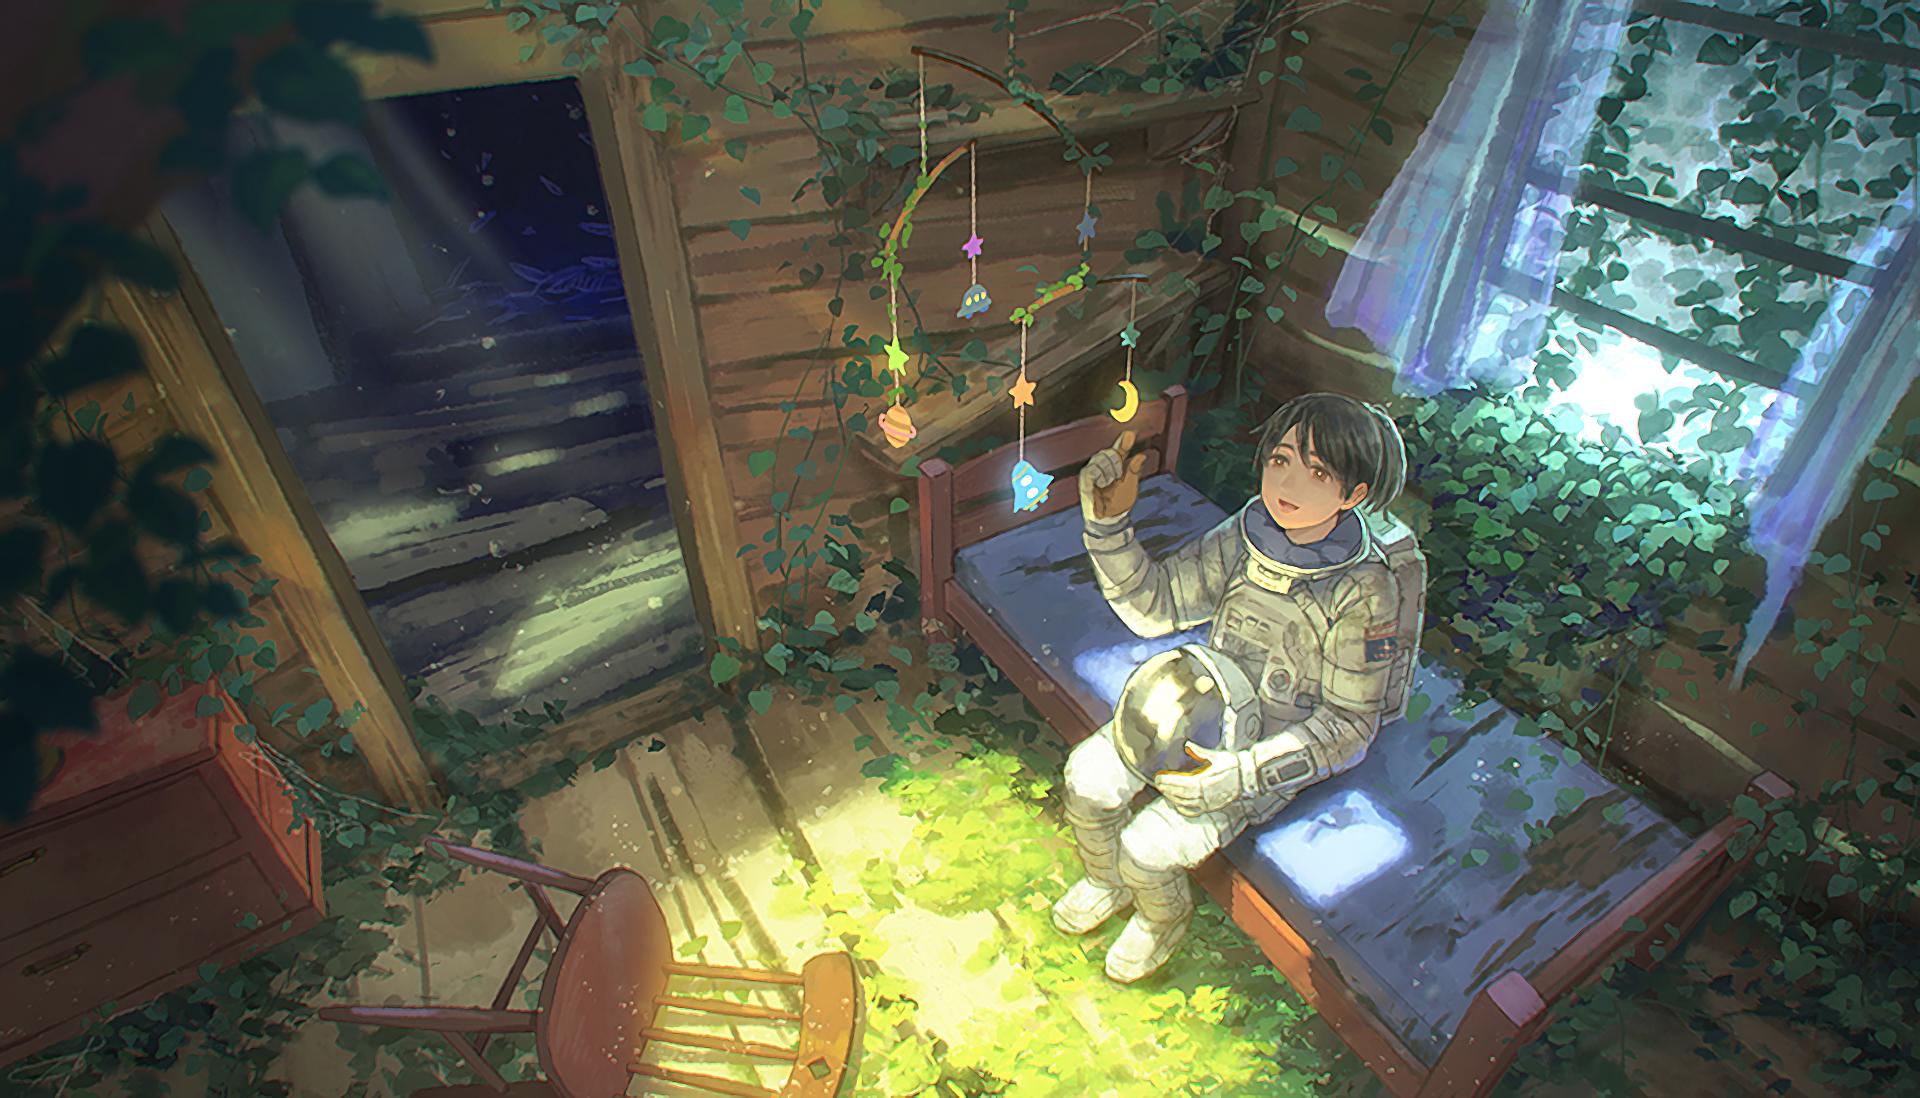 Anime - Original  Astronaut Wallpaper